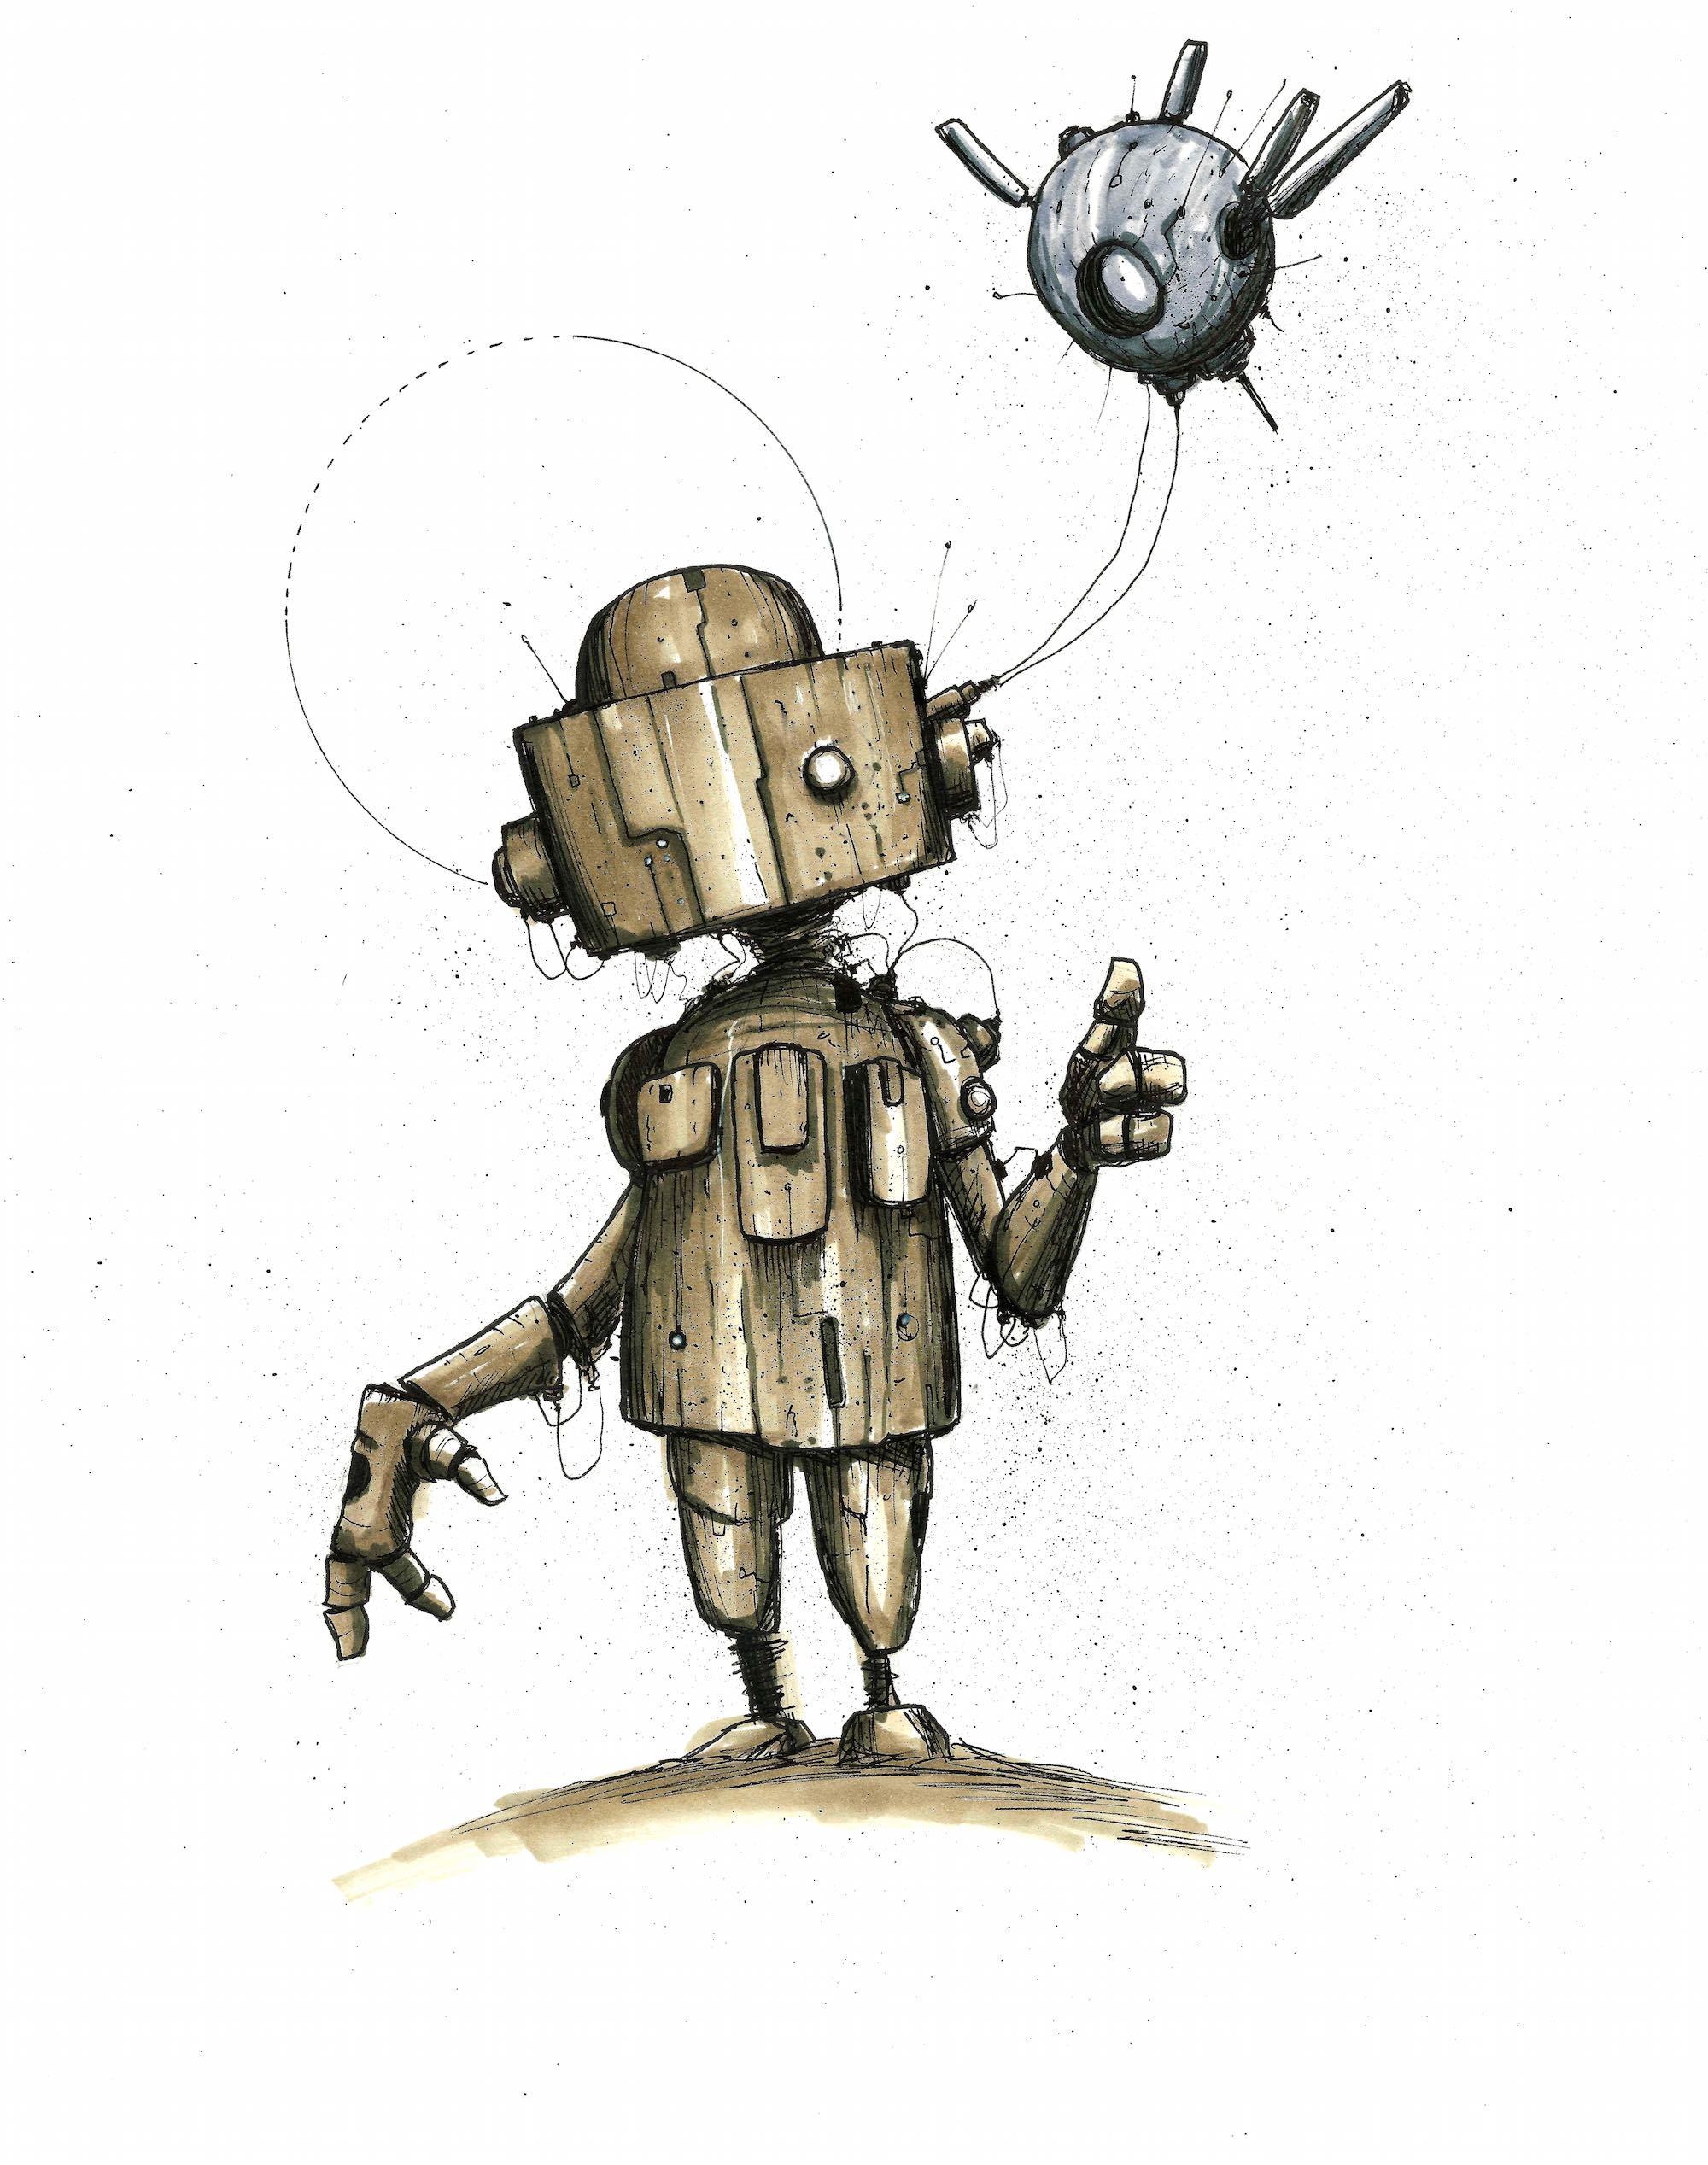 ink-bots 1.jpg